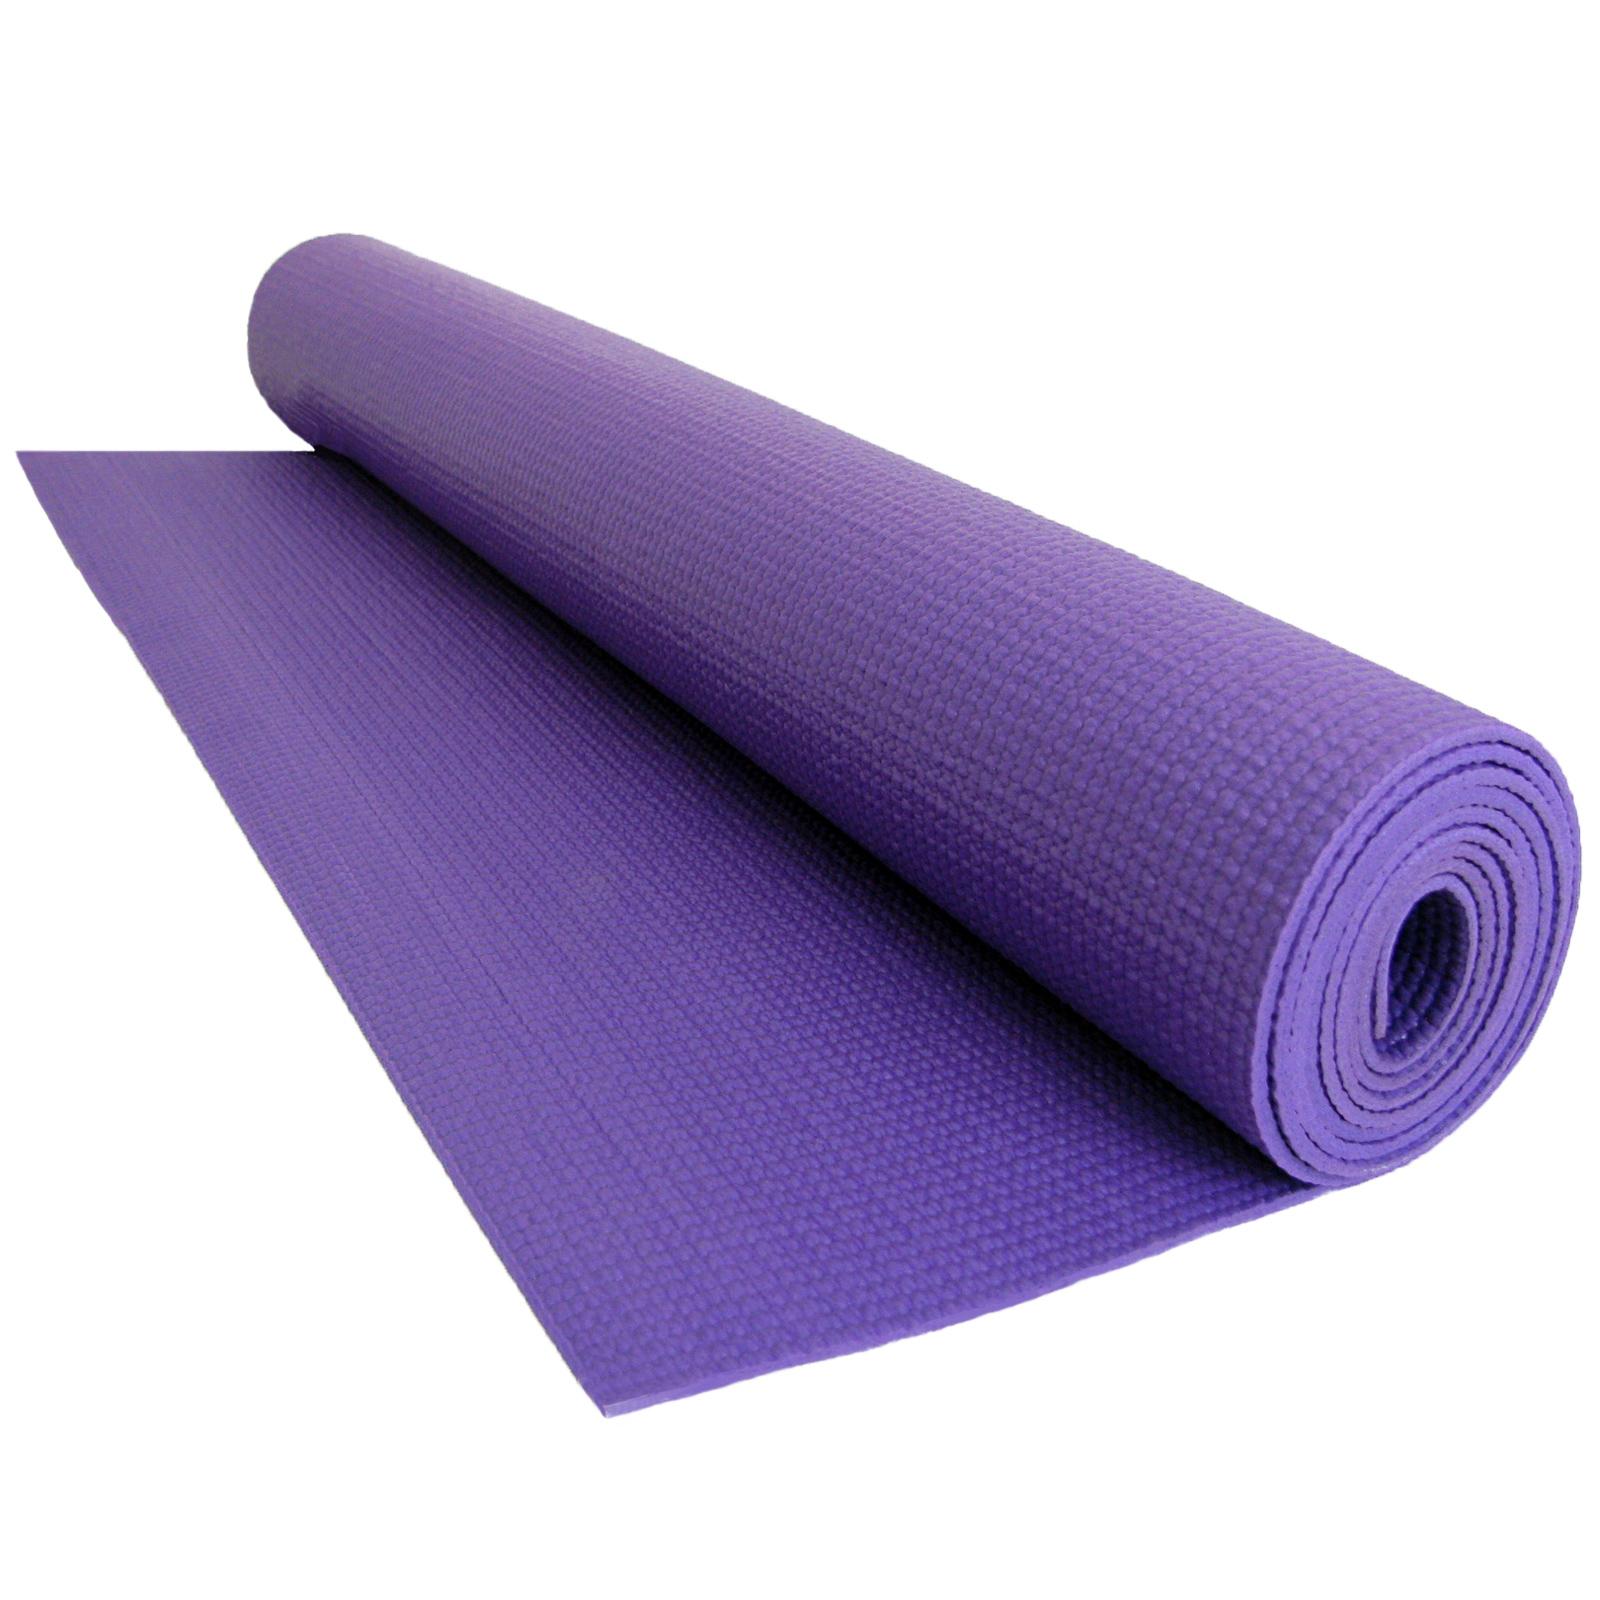 Yoga Exercise Mat Fitness Physio Pilates Gym Non Slip